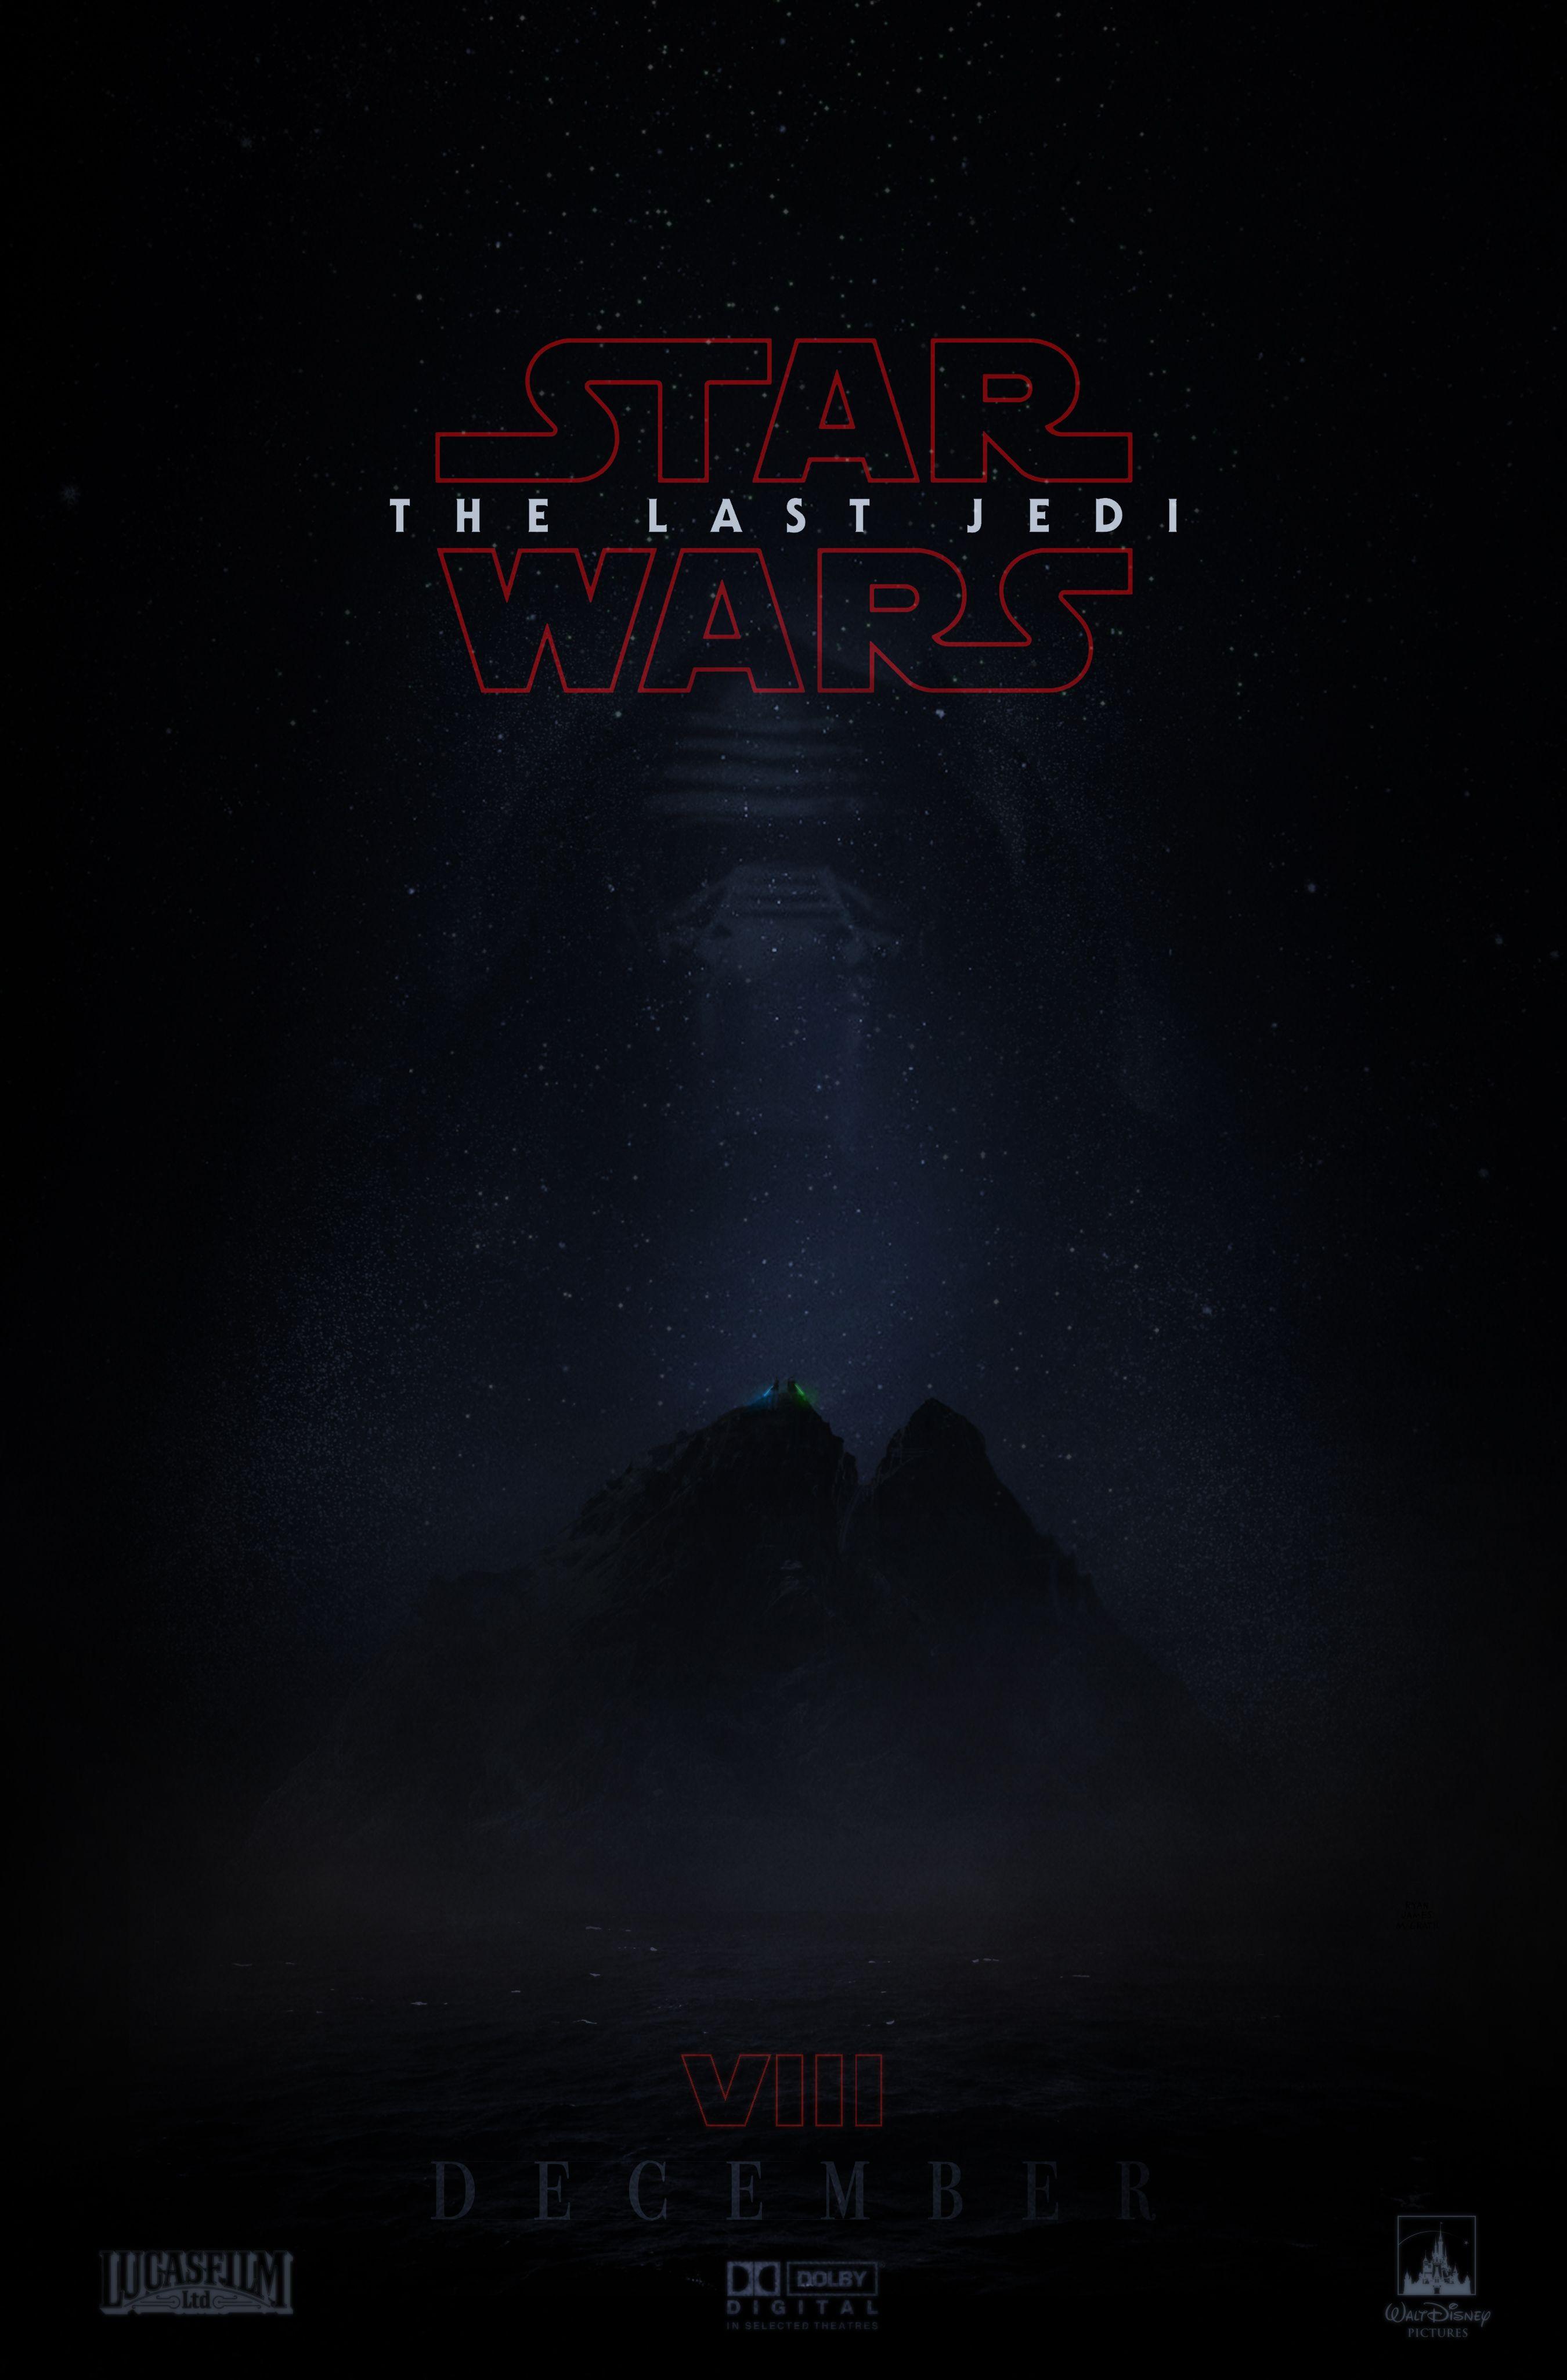 star wars episode viii - the last jedi (2017) hd wallpaper from